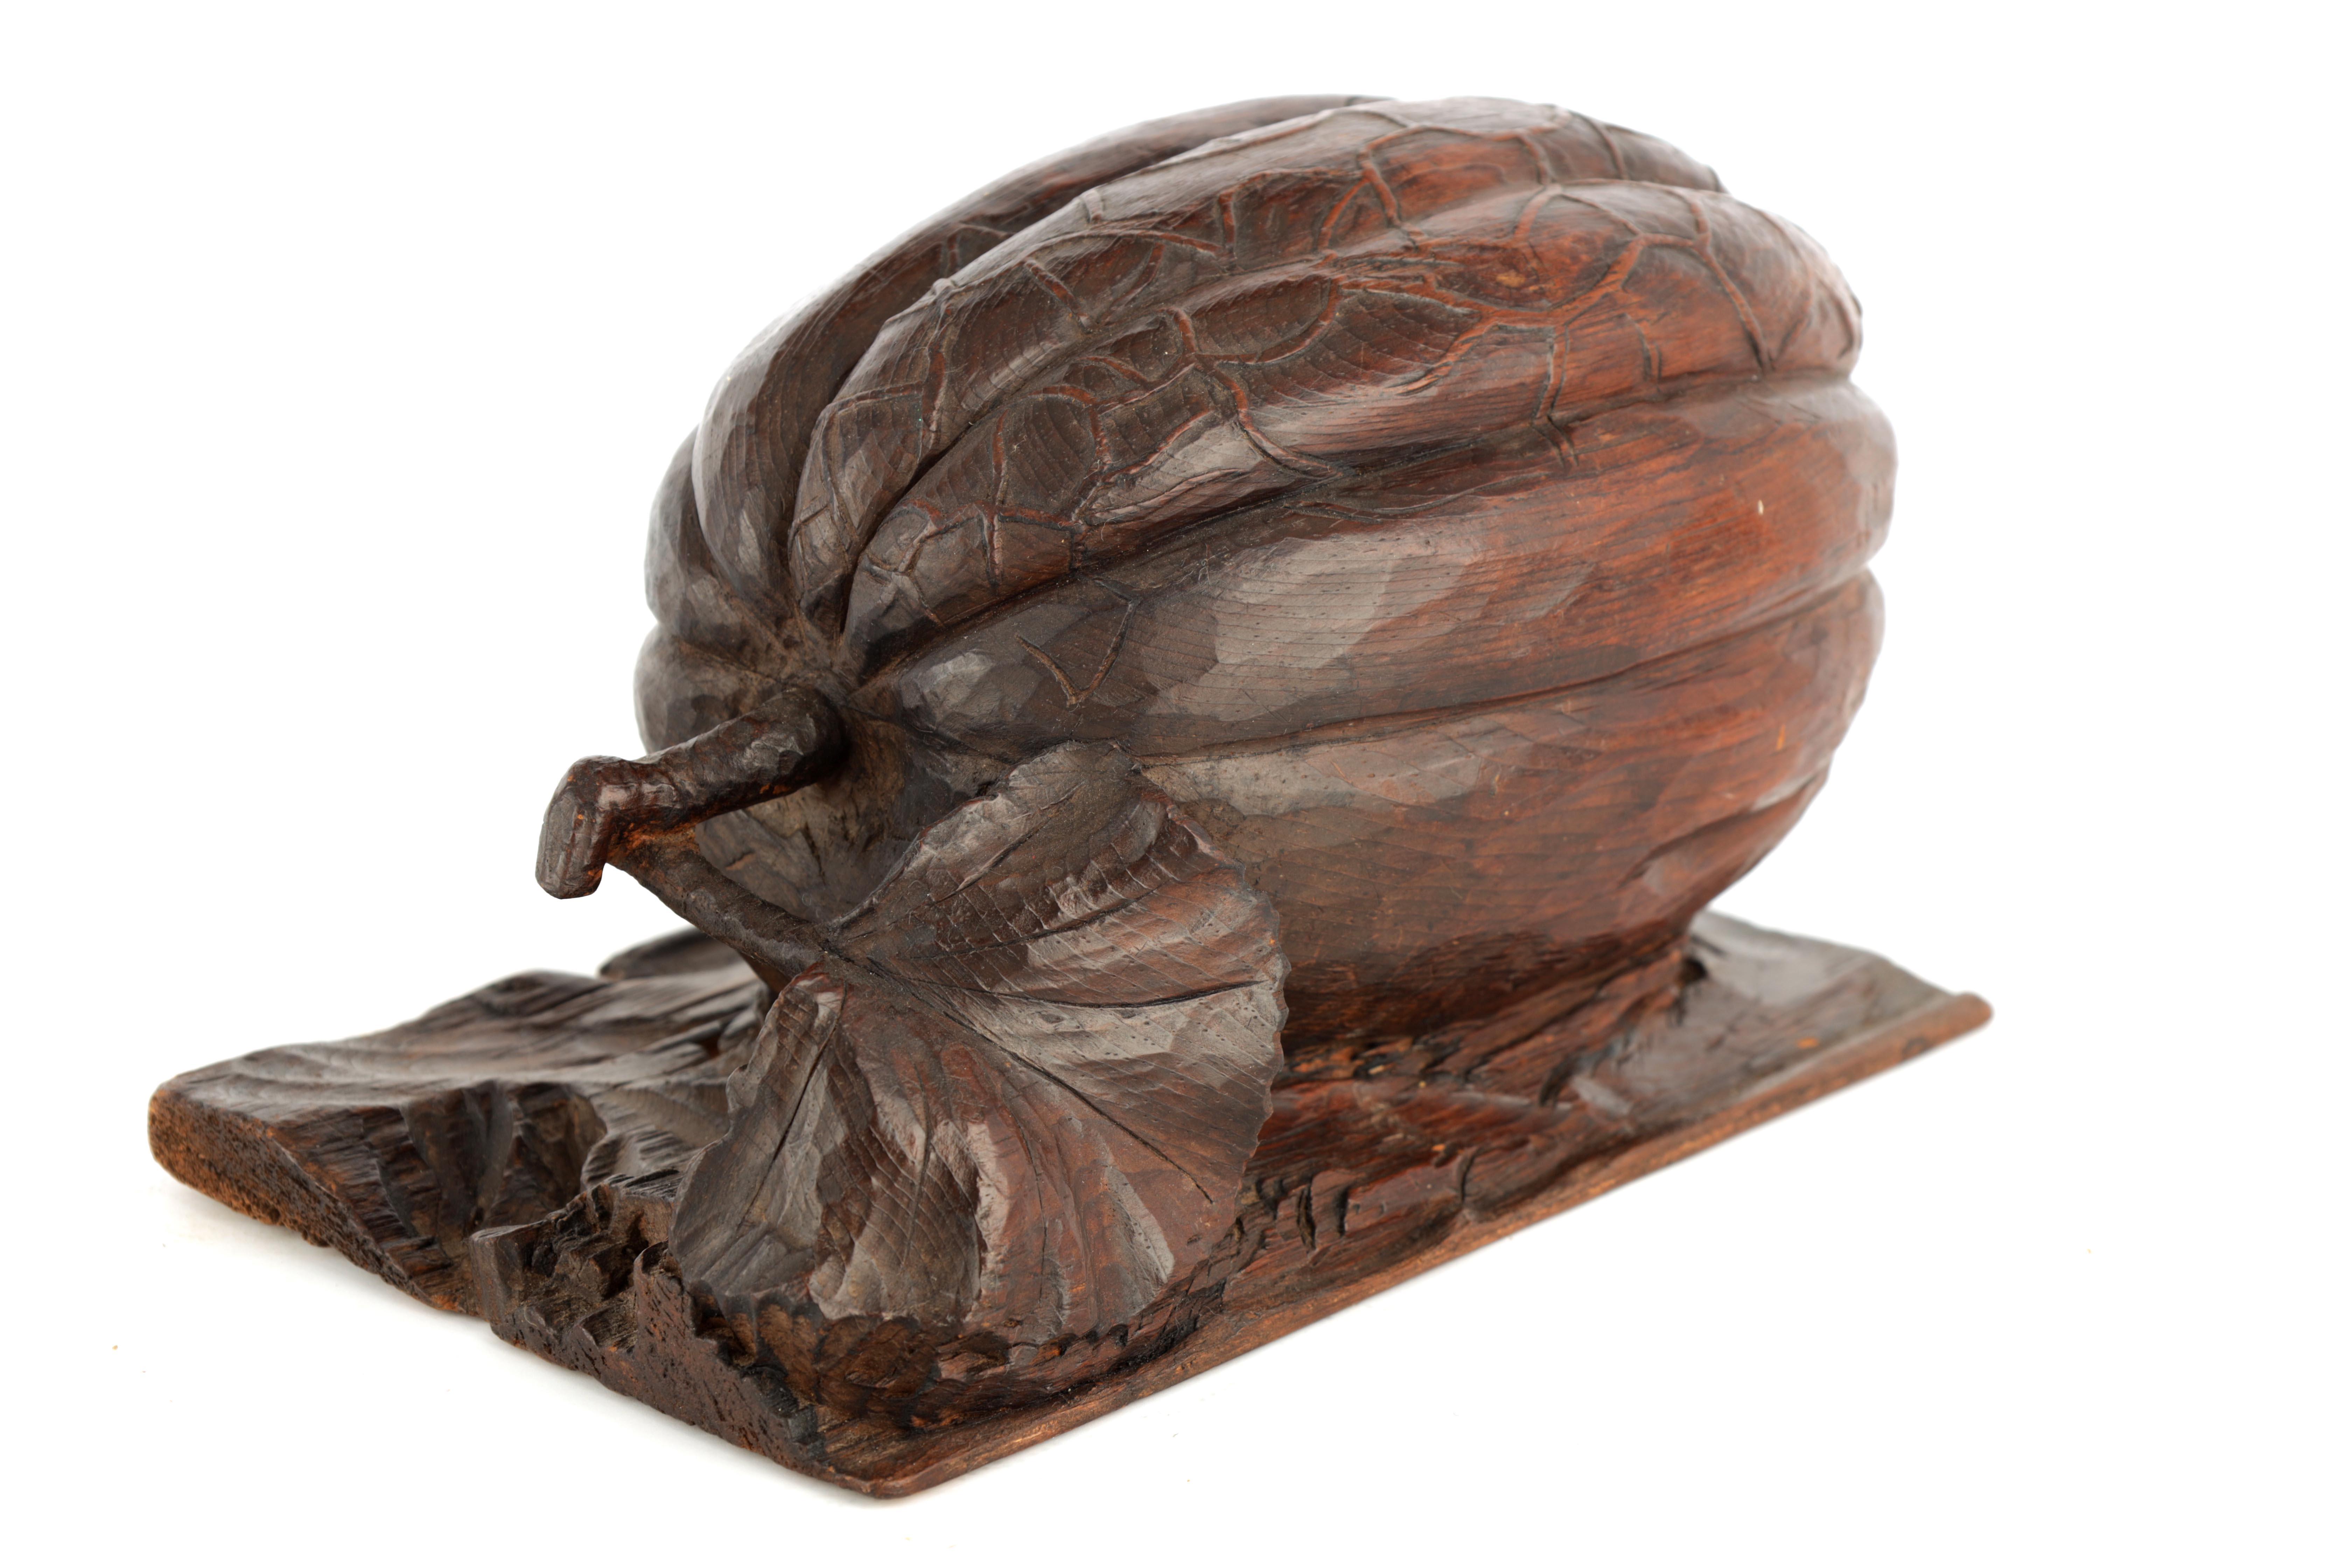 A 19TH CENTURY CARVED OAK SCULPTURE modelled as a pumpkin on a naturalistic base 23.5cm wide, 13cm